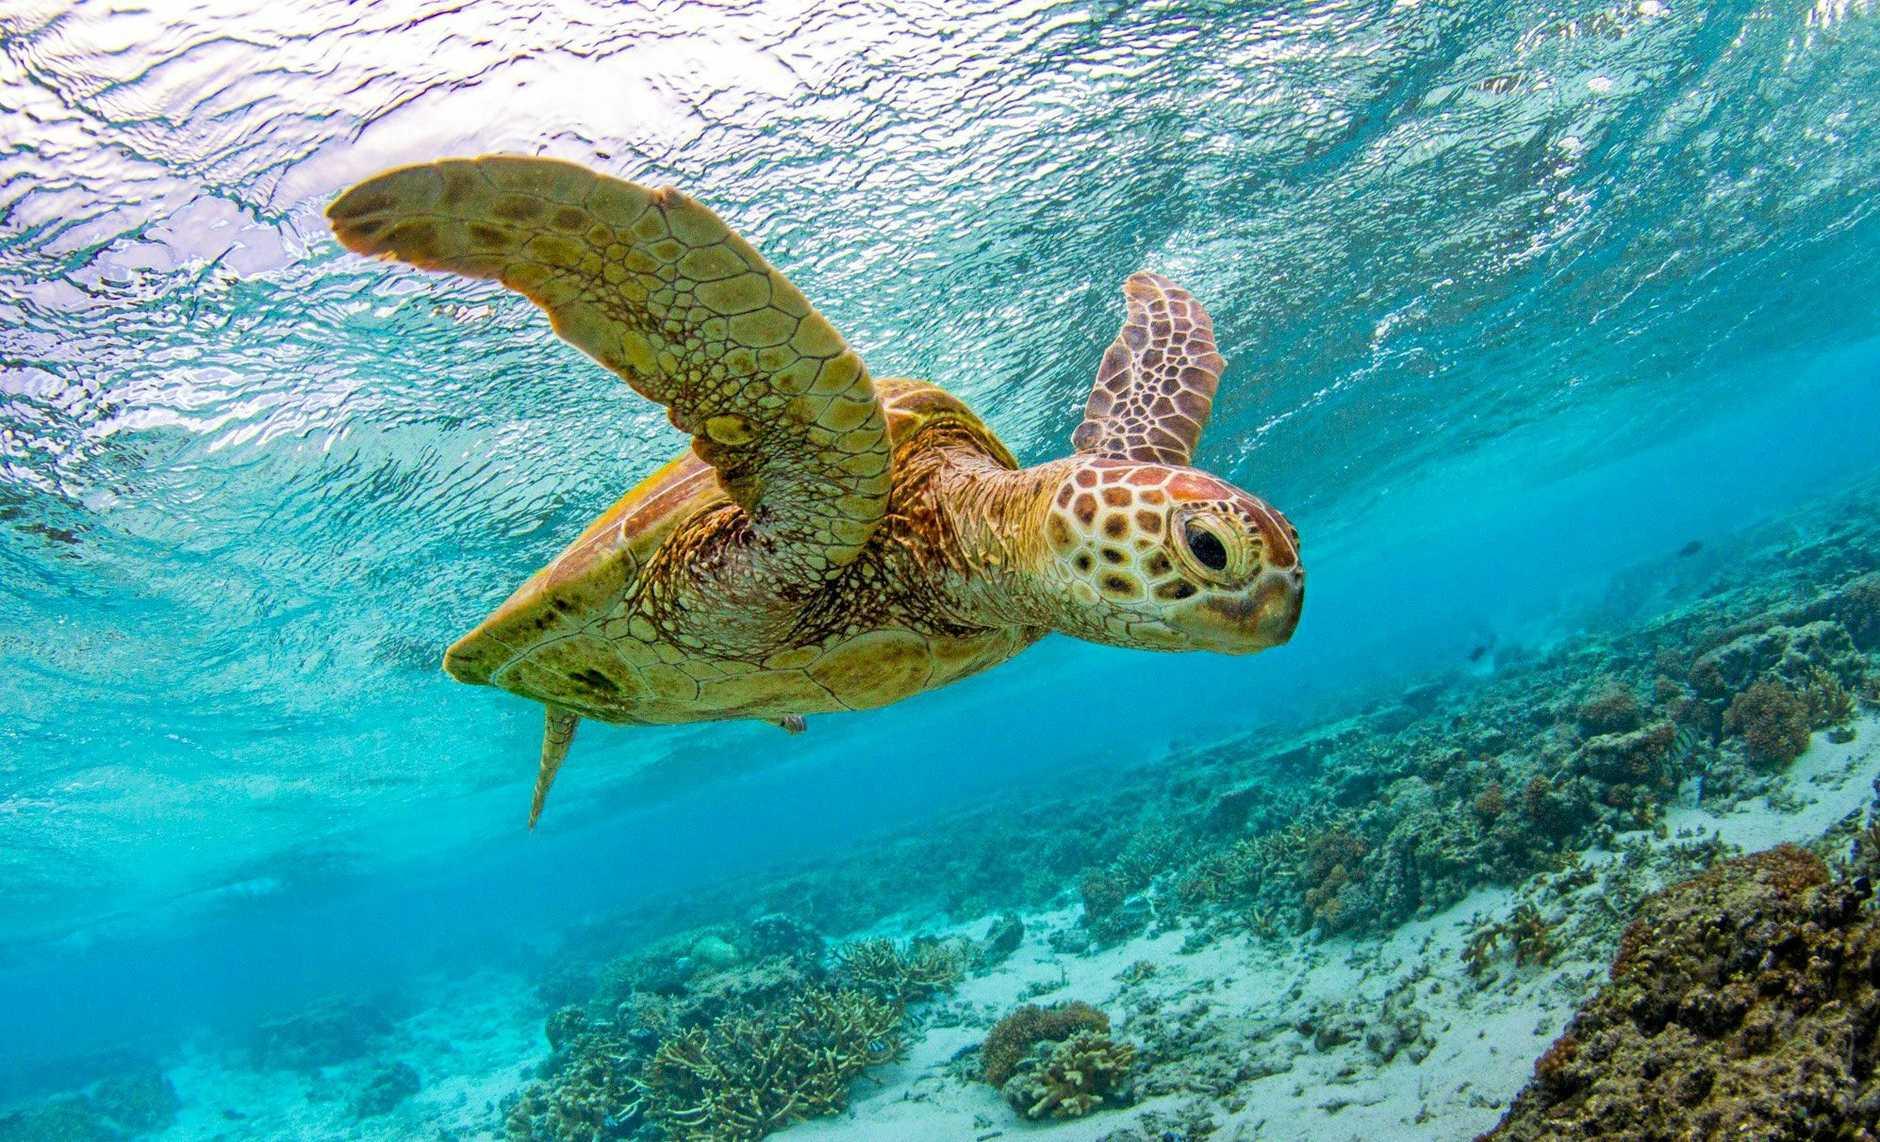 Lady Elliot Island Eco Resort received $2 million in funding.